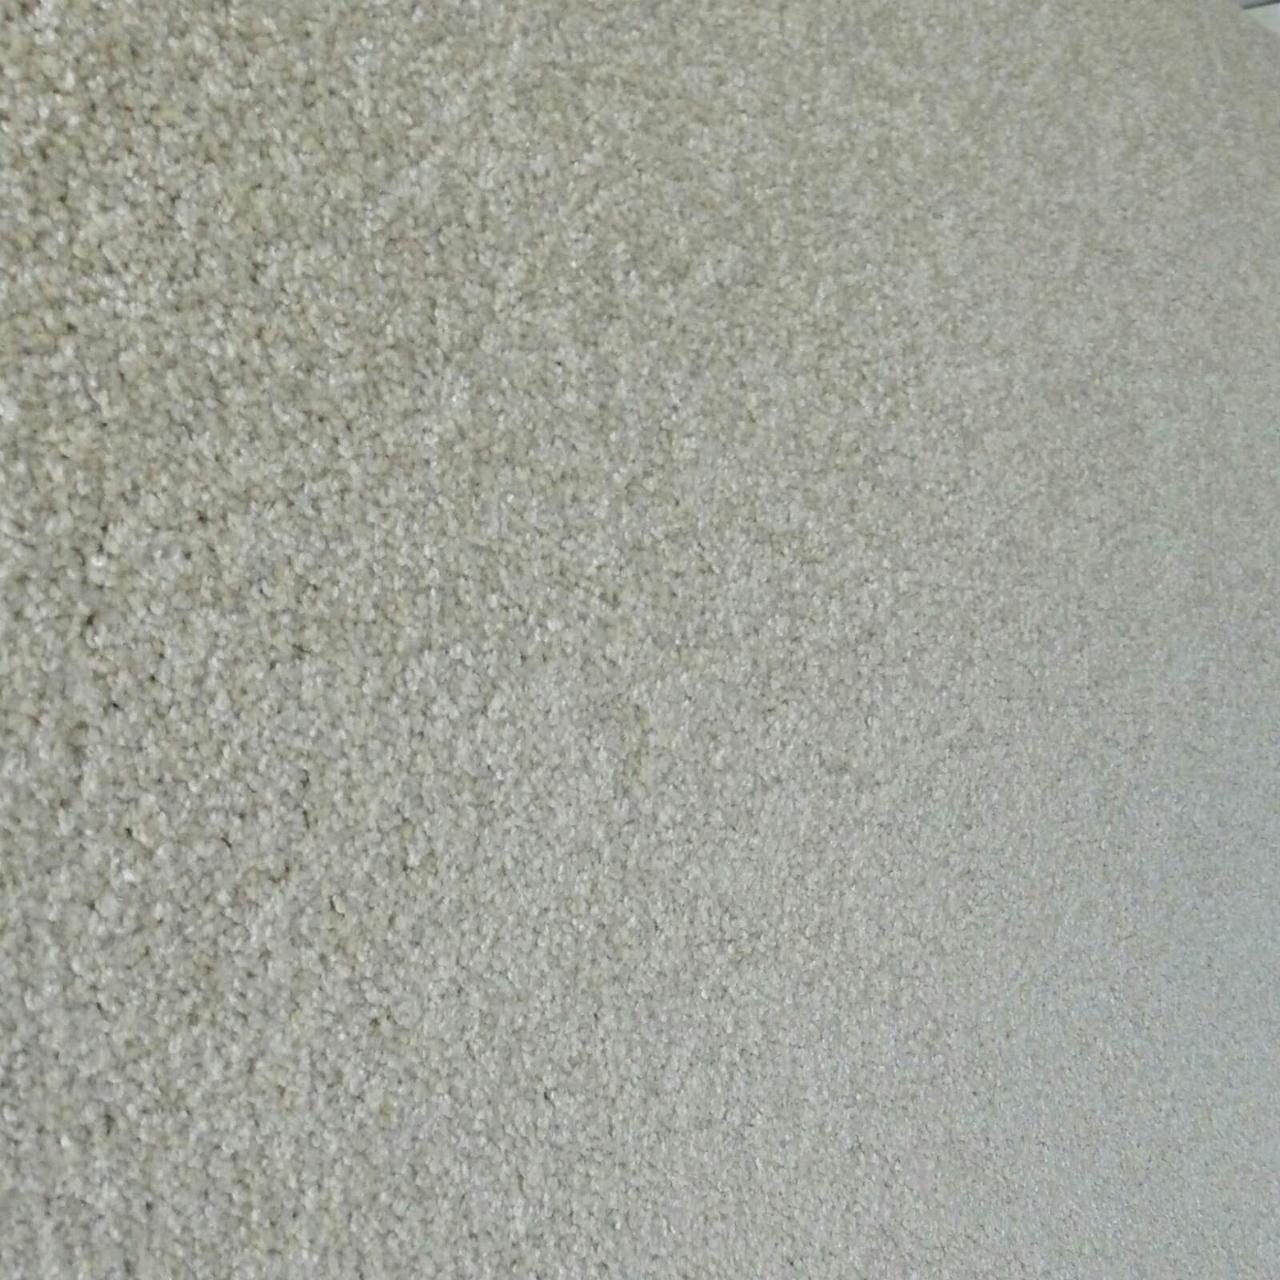 Ковролин Династия 114 ширина  5 метров